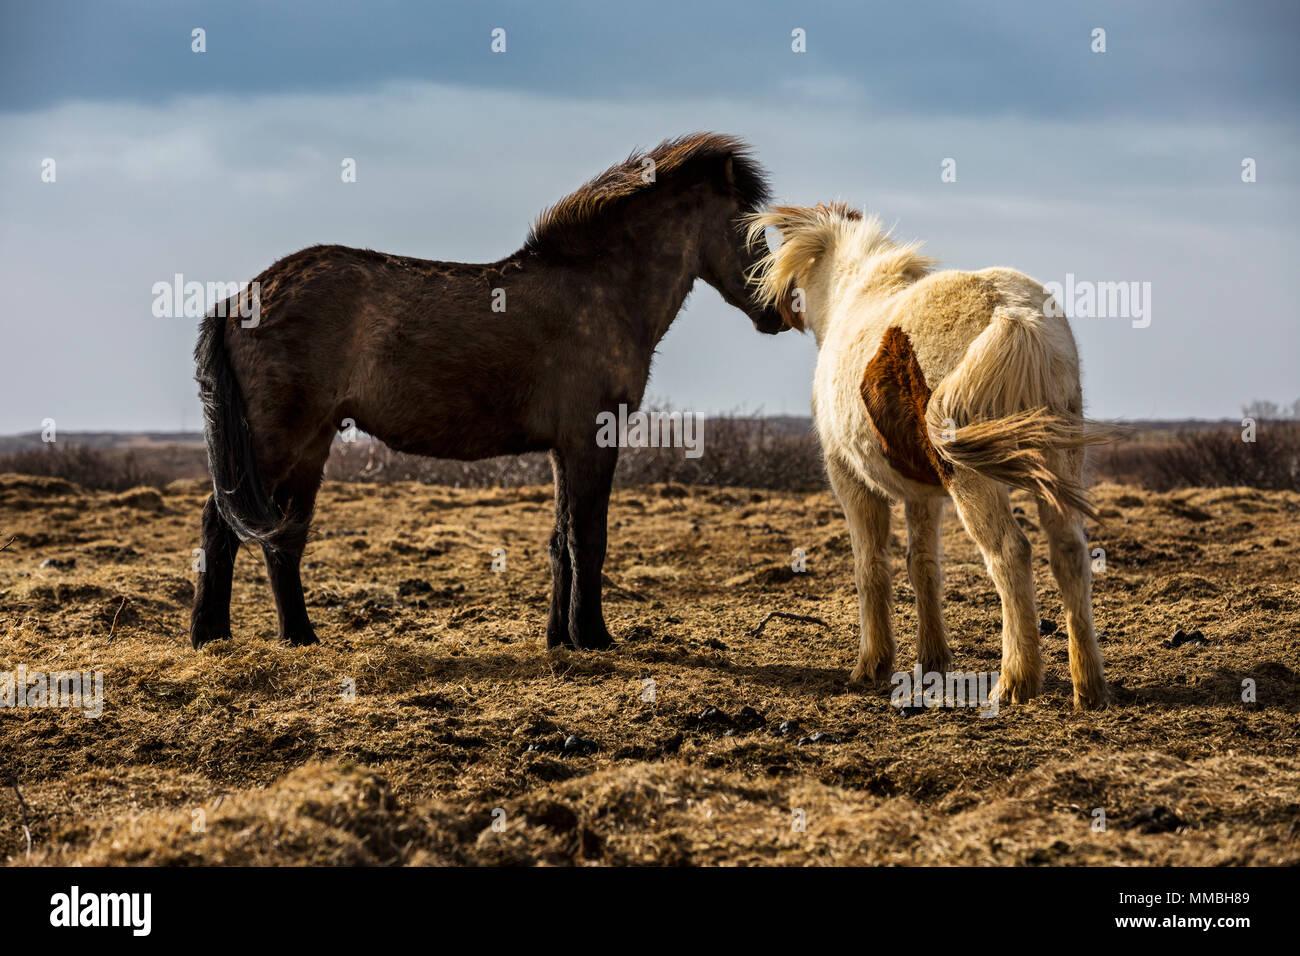 Two Icelandic horses - Stock Image